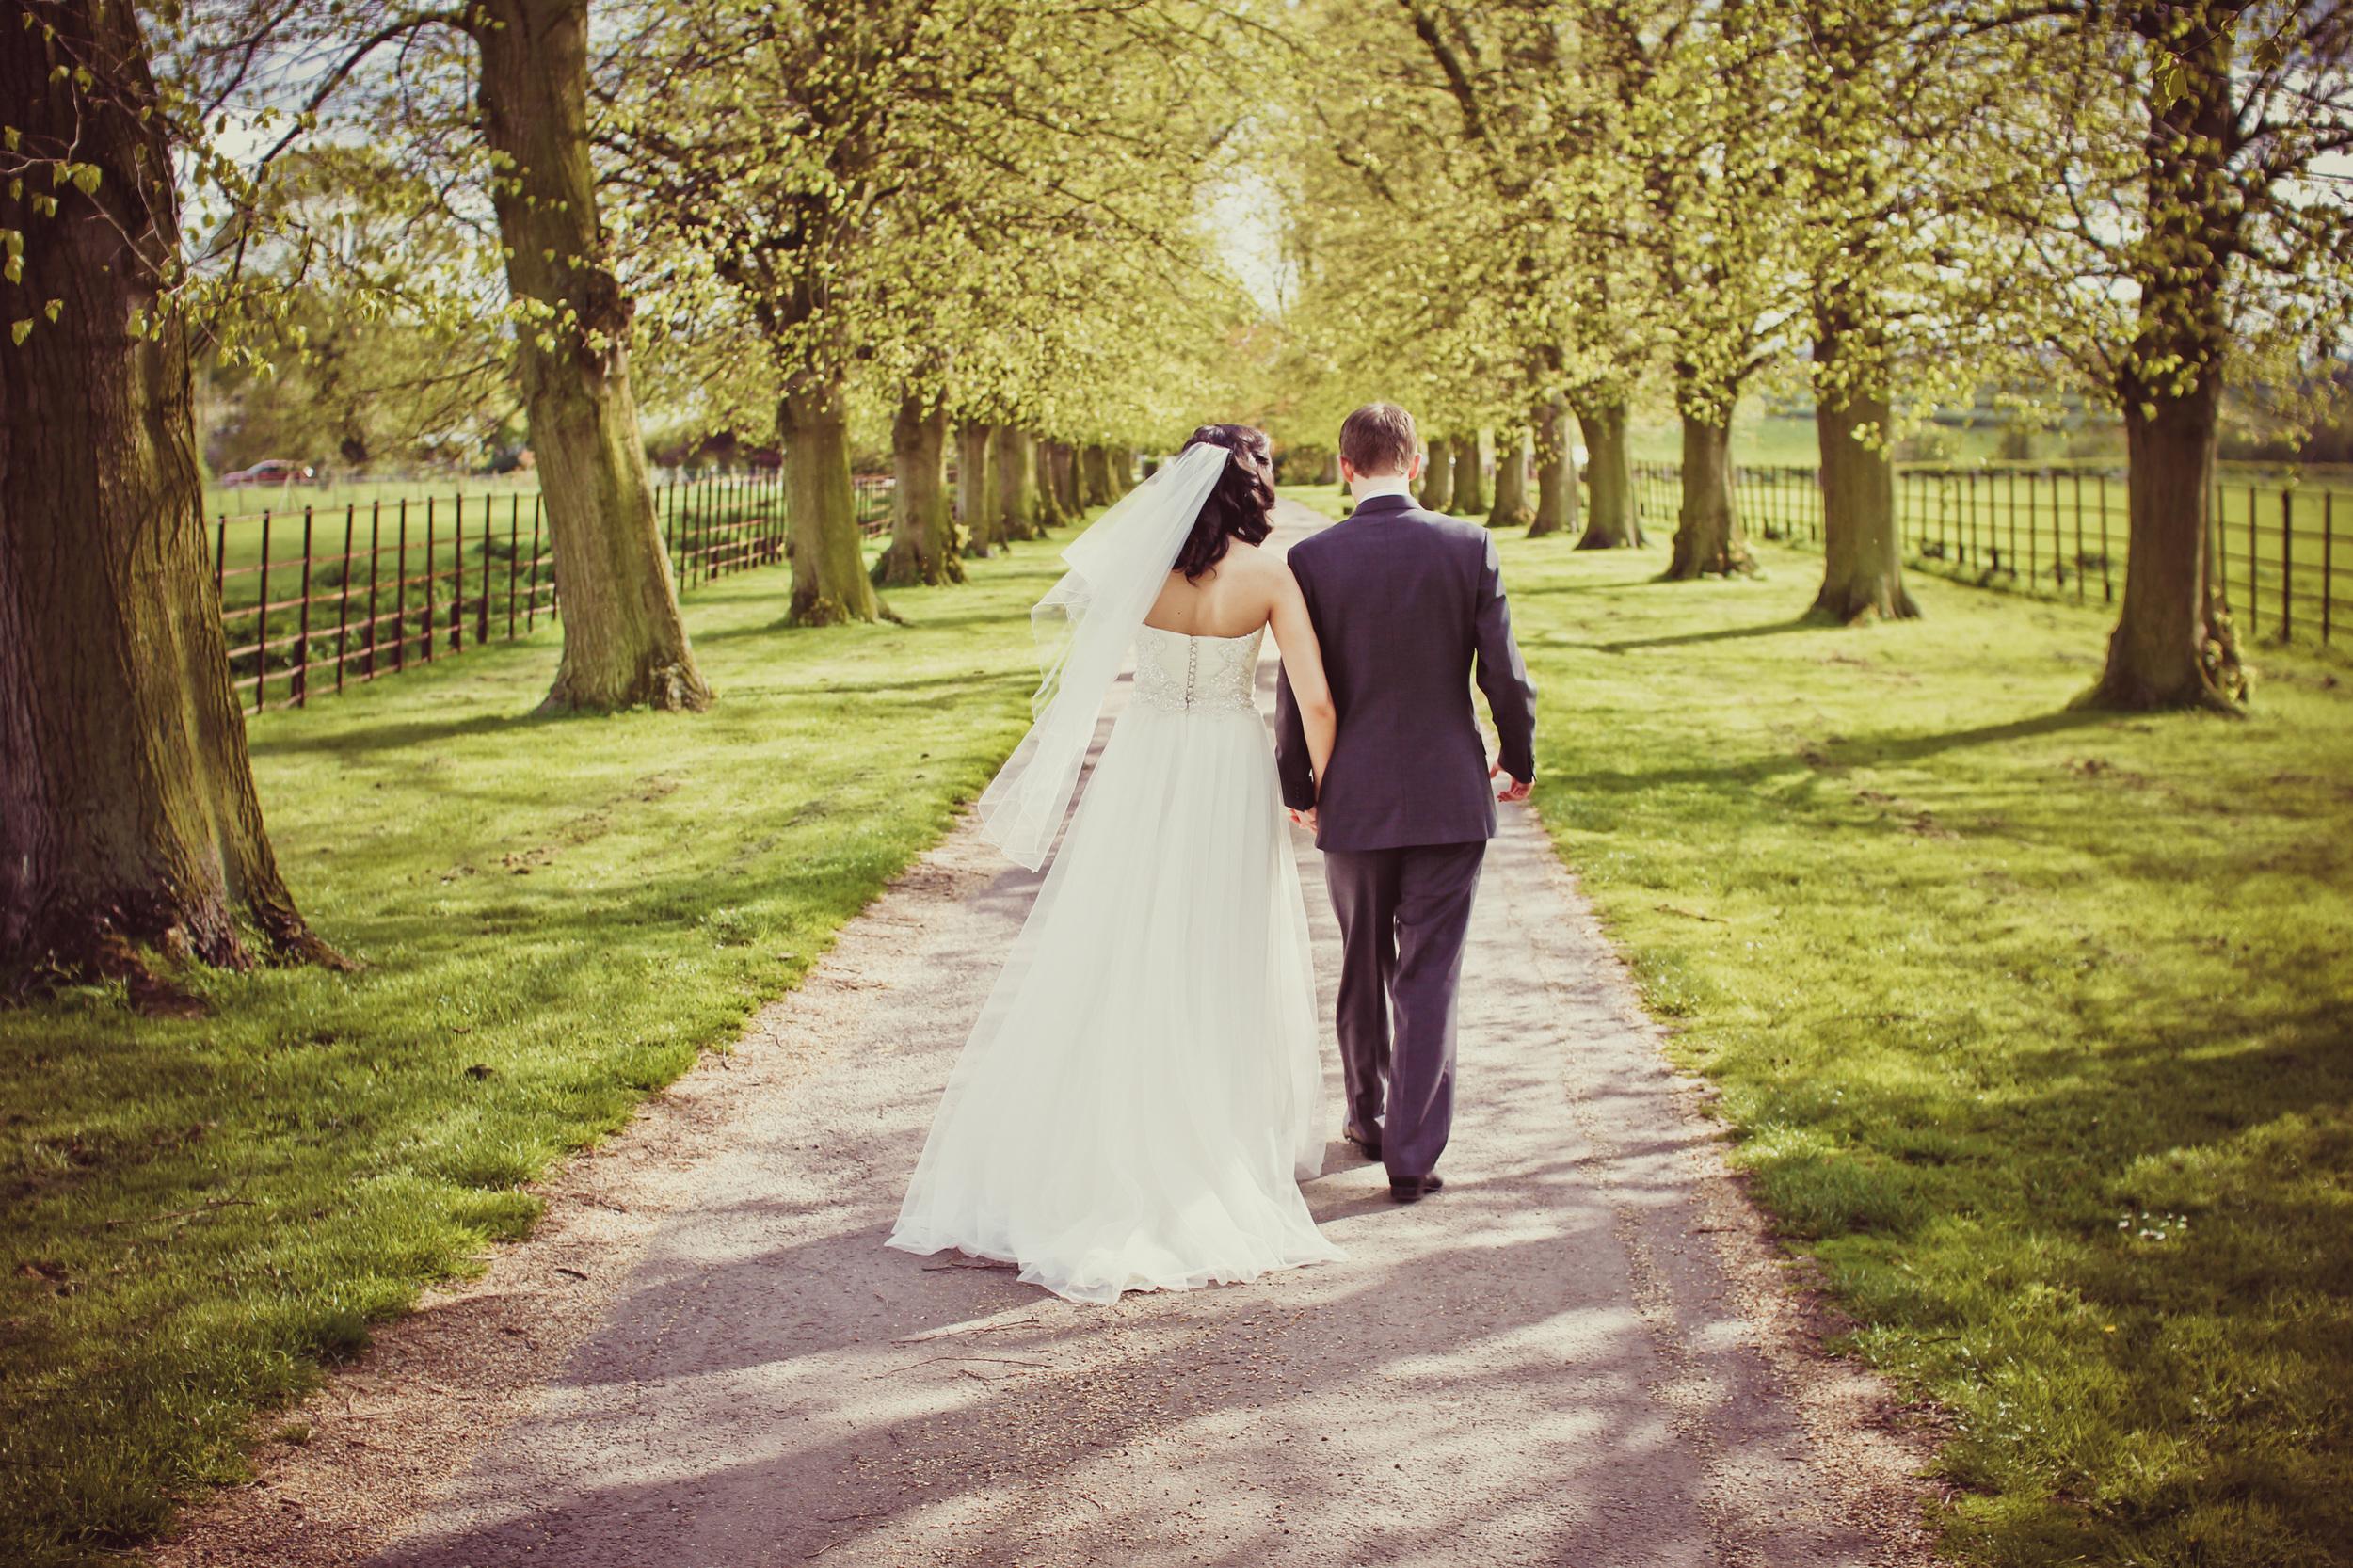 little-wedding-walk